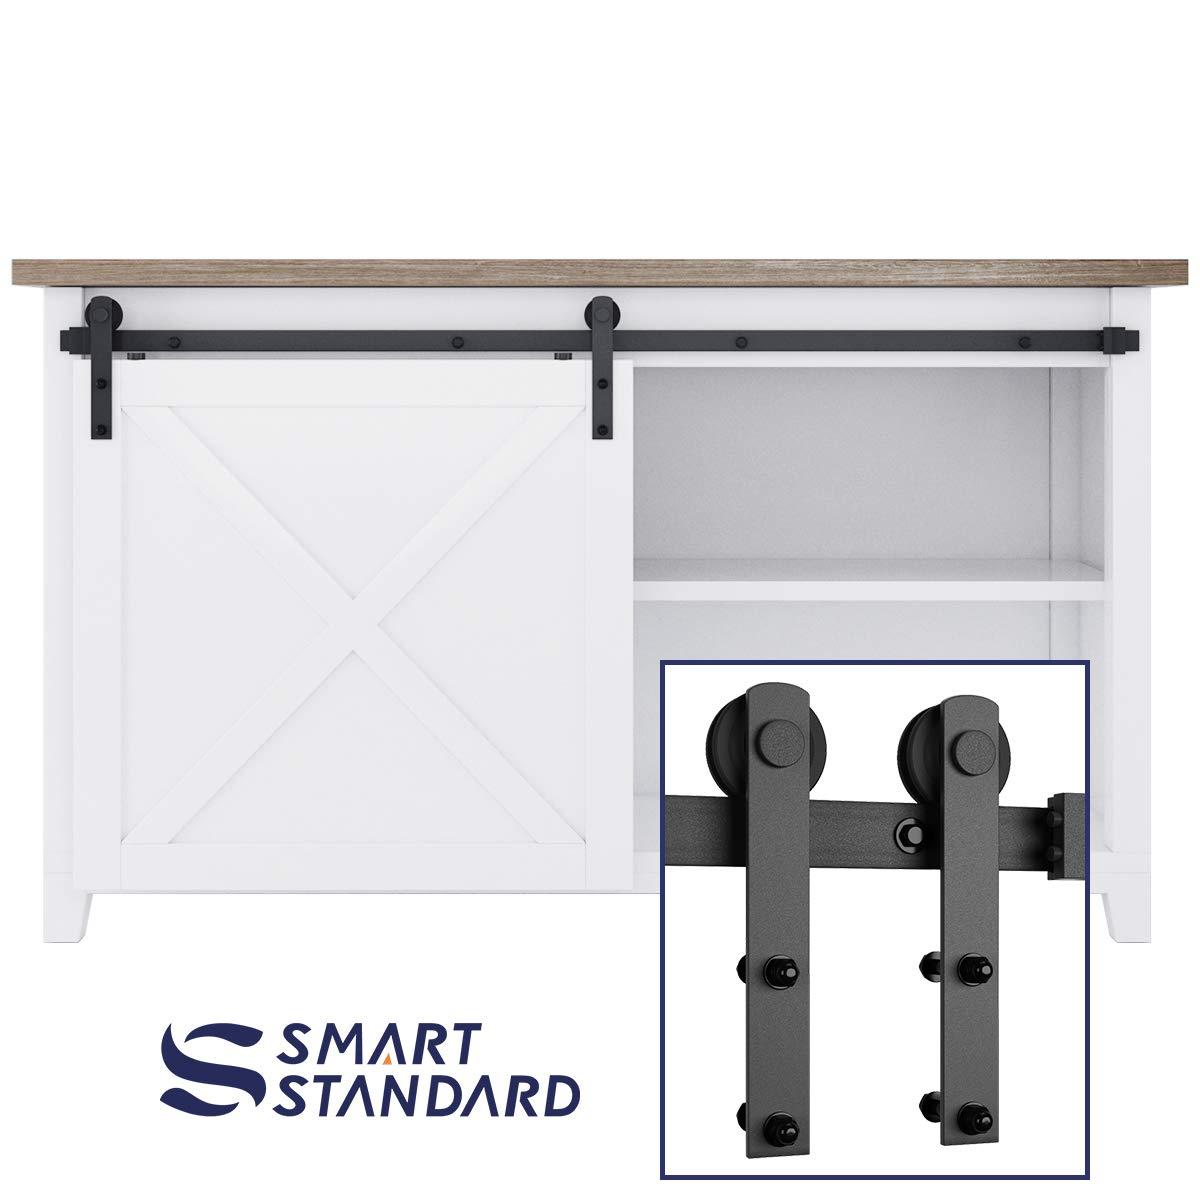 SMARTSTANDARD 5FT Mini Sliding Barn Door Cabinet Hardware Kit for Cabinet TV Stand Closet, Black, One-Piece Track Rail, Easy to Install, Fit 30'' Wide Single DoorPanel , I Shape Hanger (NO Cabinet)